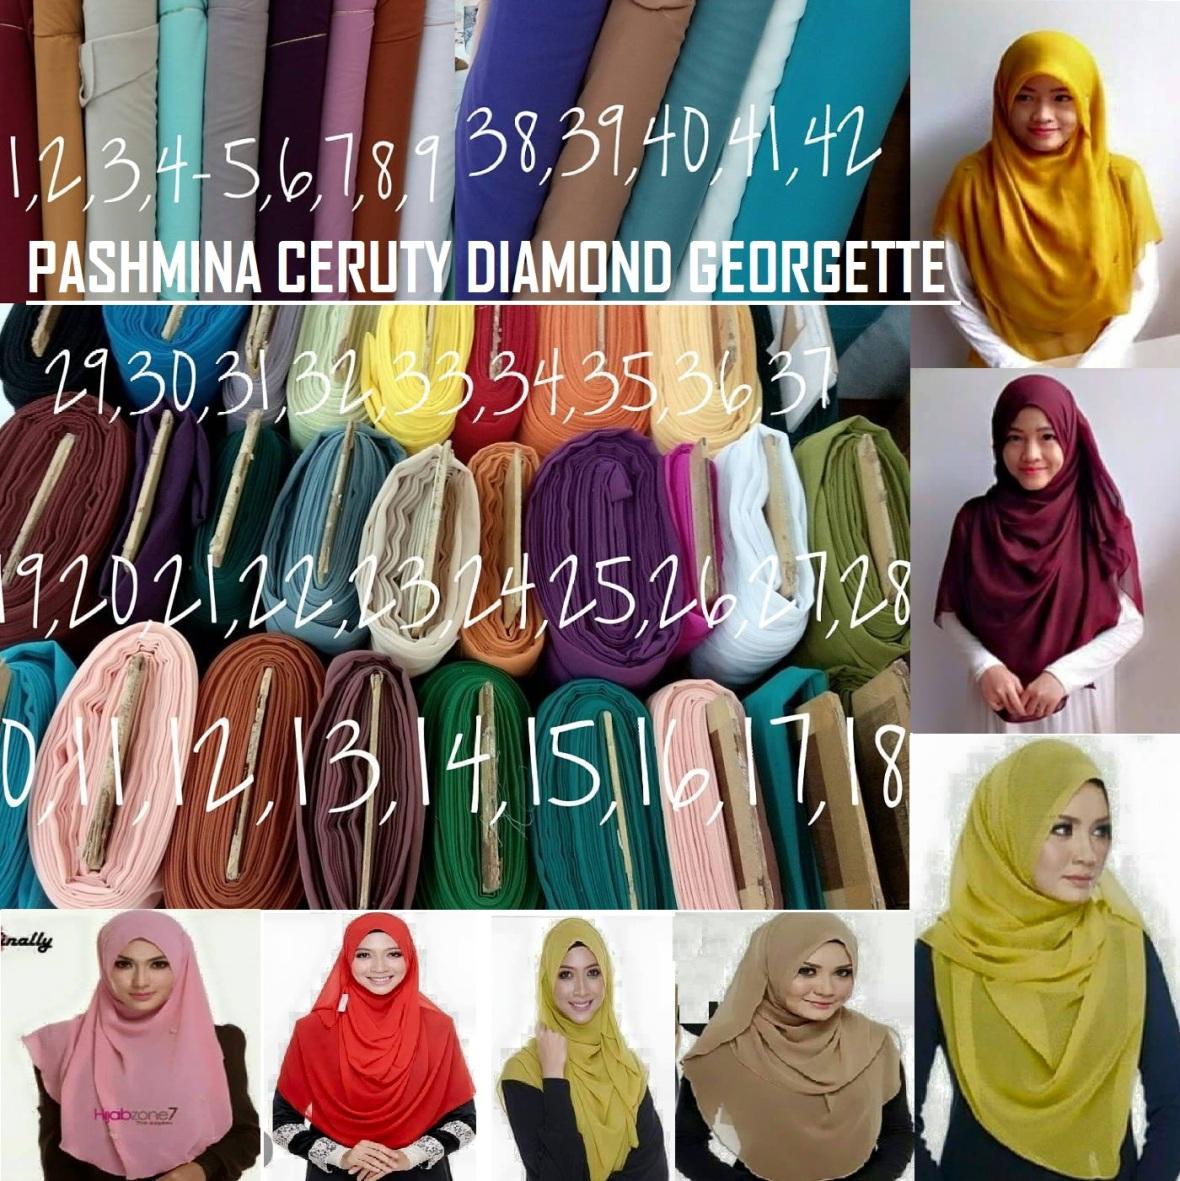 pashmina-ceruty-diamond-georgette-mewah-dan-anggun